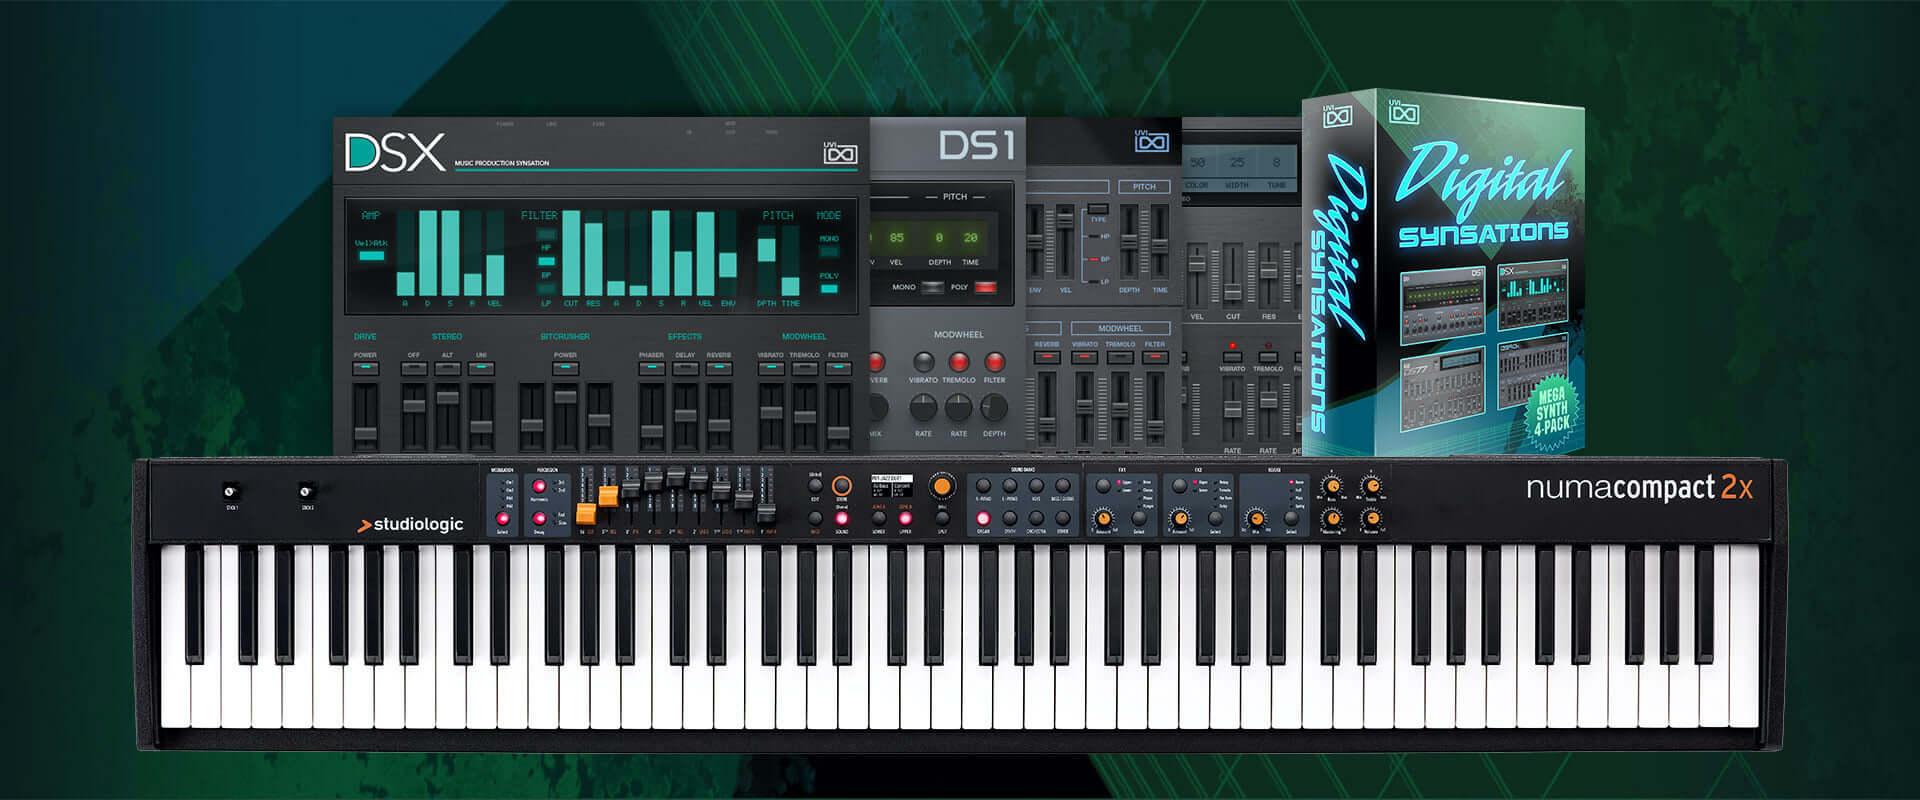 Studiologic製品購入でUVI『Digital Synsations』もプレゼント!期間限定キャンペーンが開始 music200402_studiologic_5-1920x800